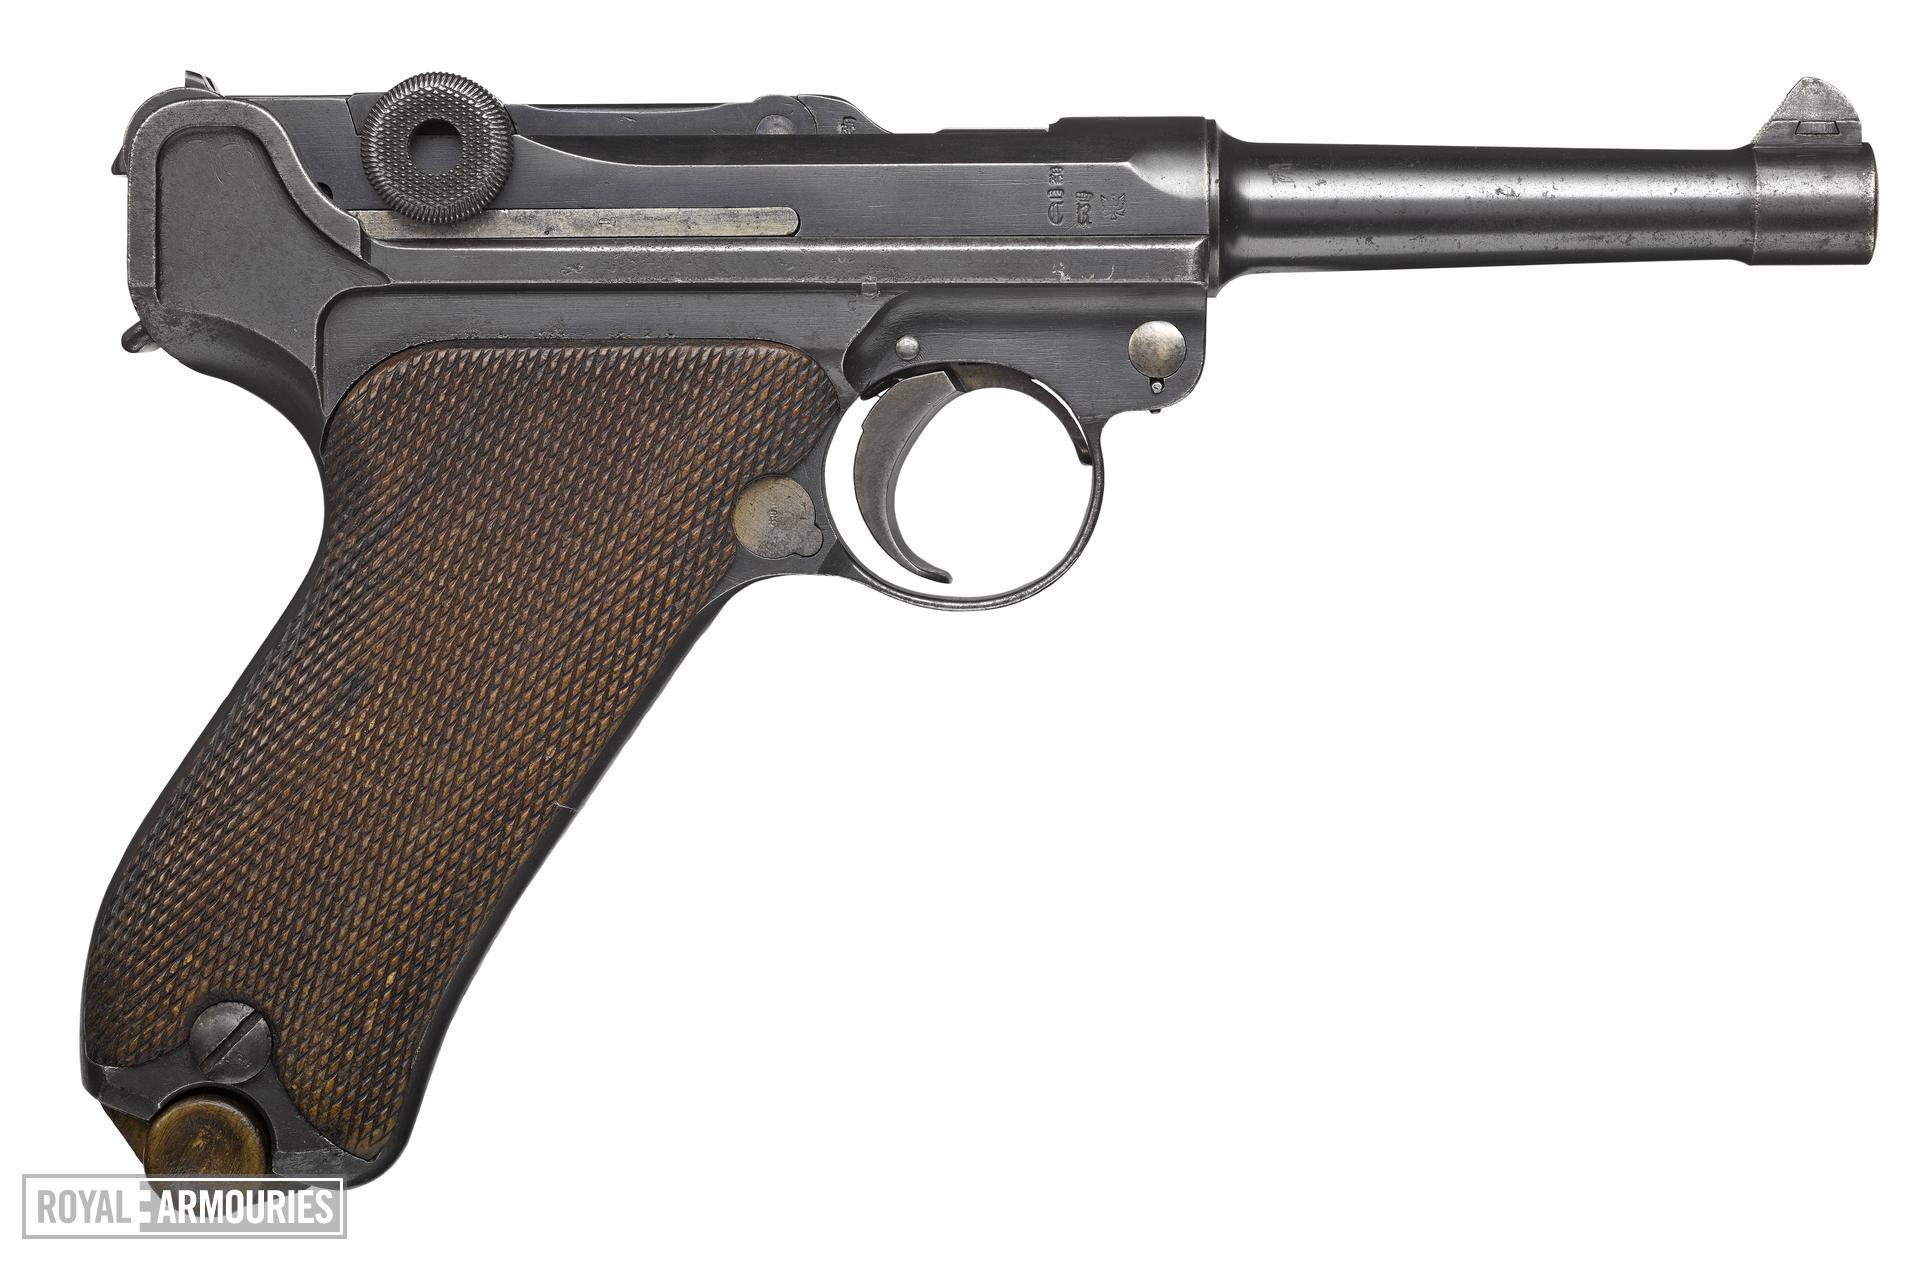 Pistole 08 (P08) Parabellum pistol (1908)(1).jpg